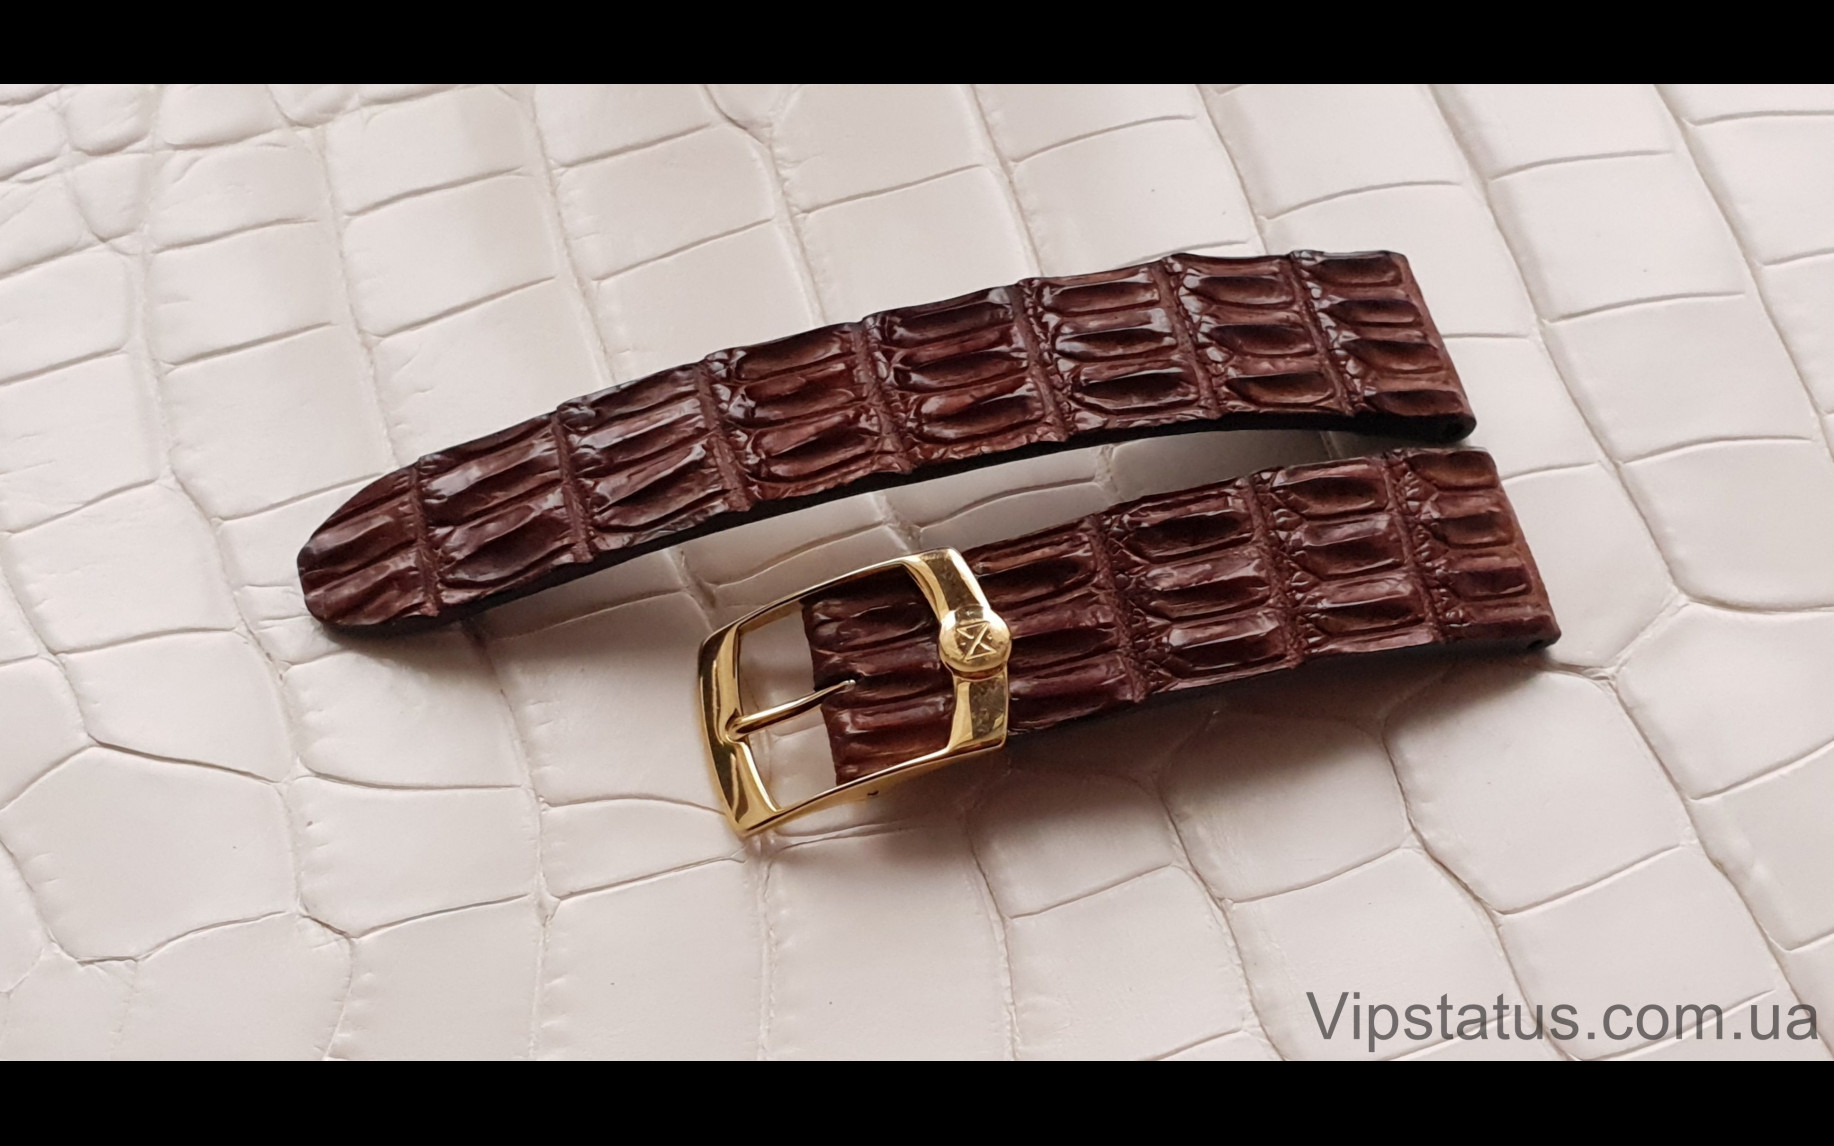 Elite Вип ремешок для часов Chopard кожа крокодила Vip Crocodile Strap for Chopard watches image 1